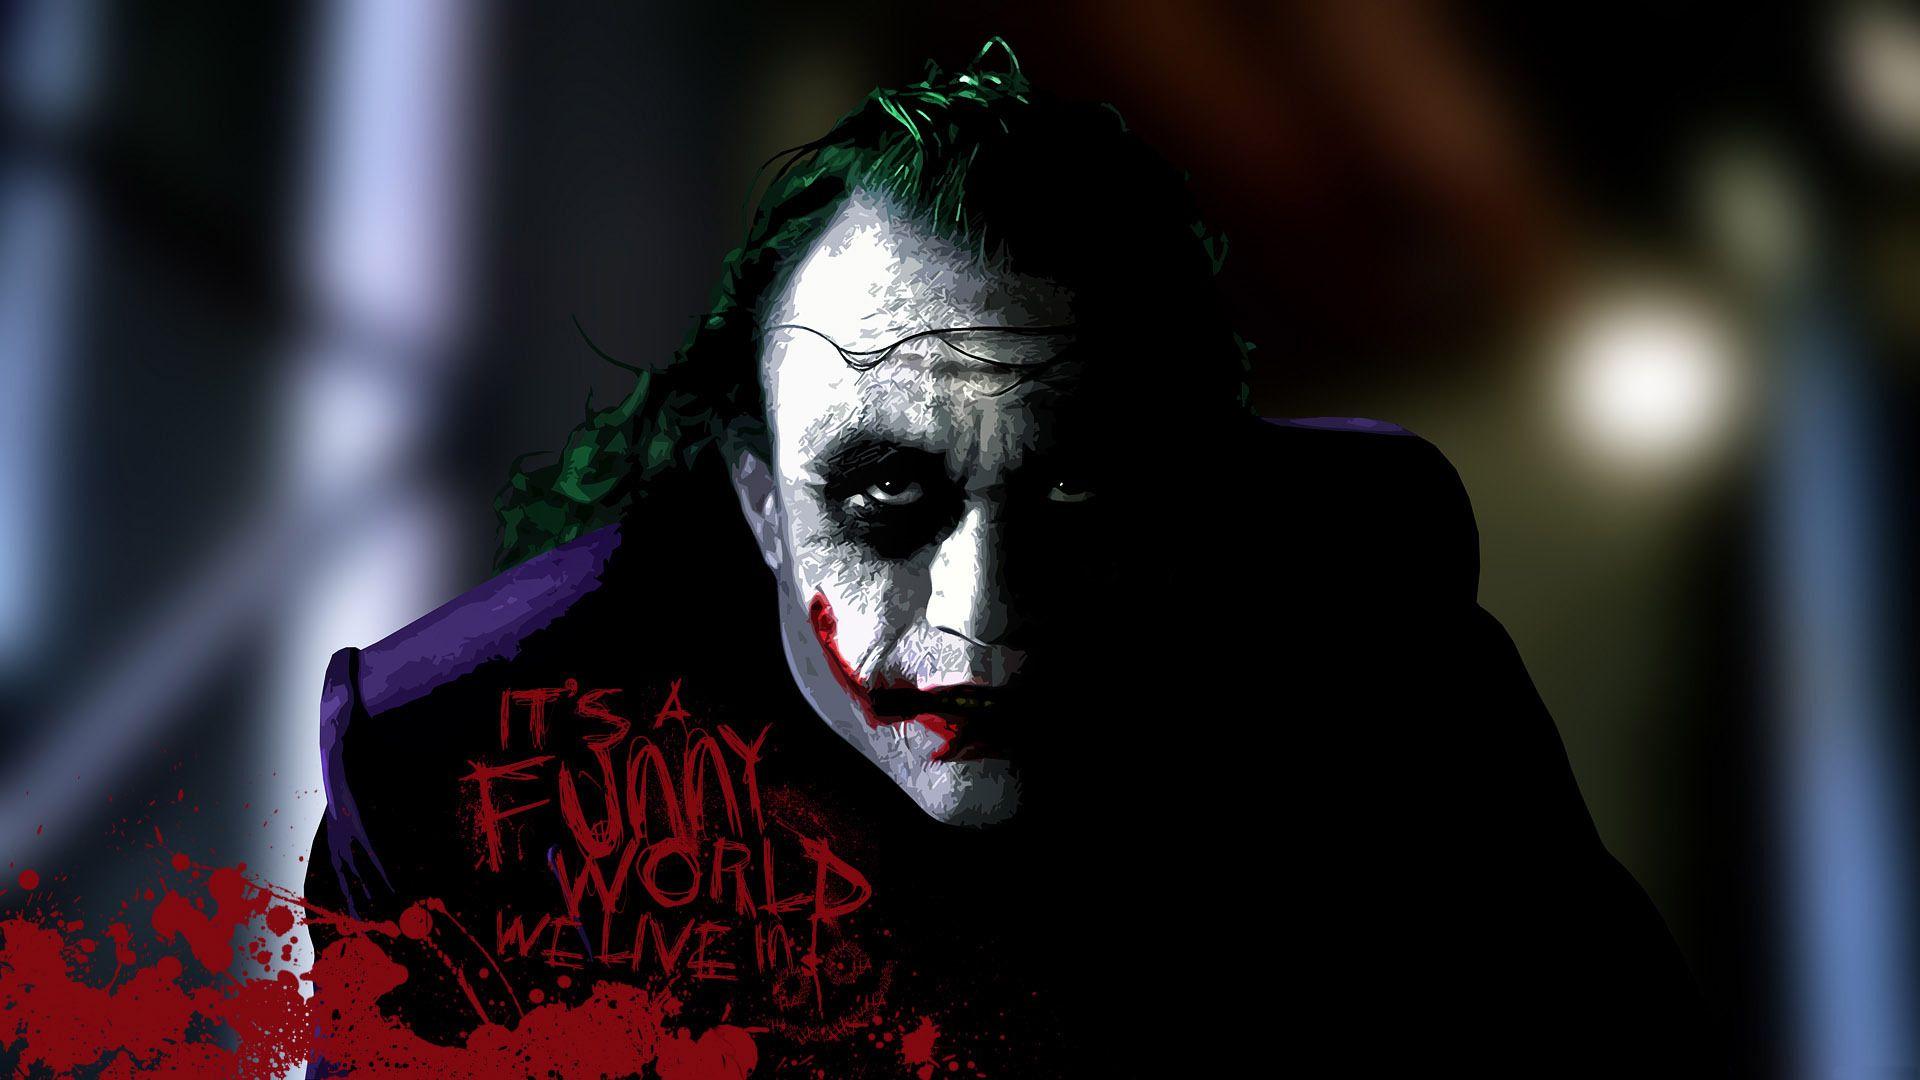 The Joker Wallpapers × The Joker Dark Knight Wallpapers